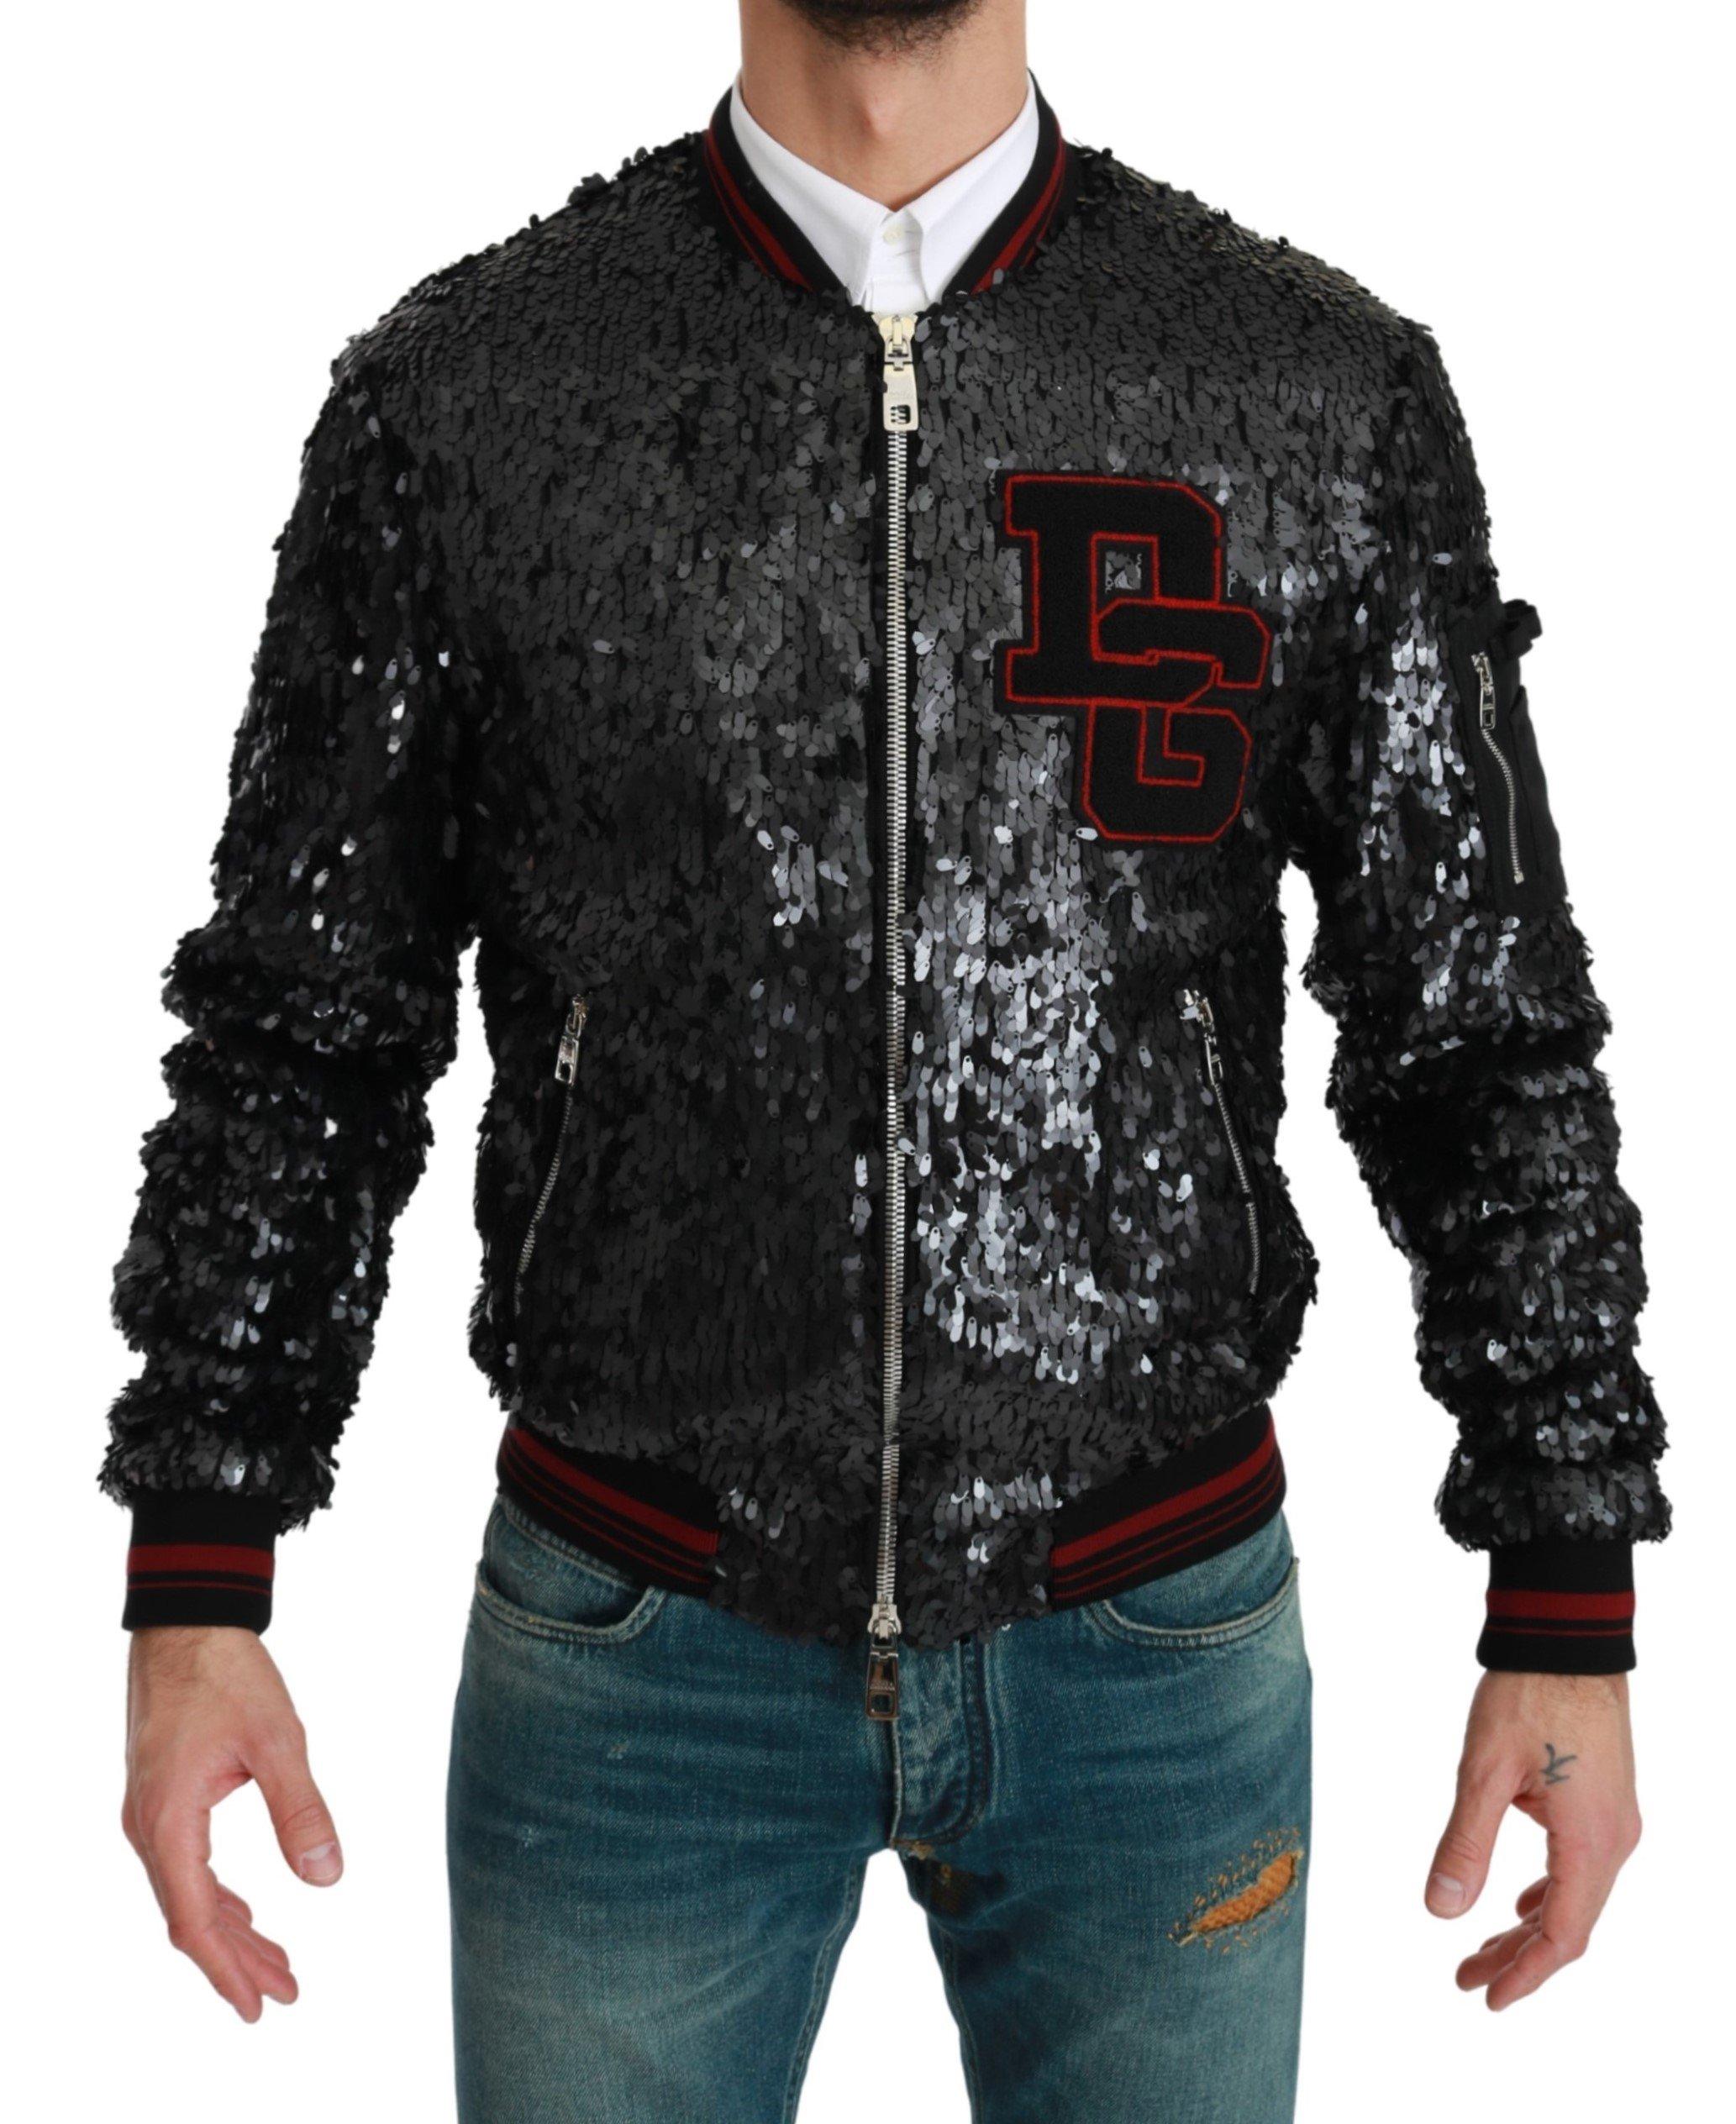 Dolce & Gabbana Men's Sequined Bomber Coat Jacket Black JKT2608 - IT44   XS